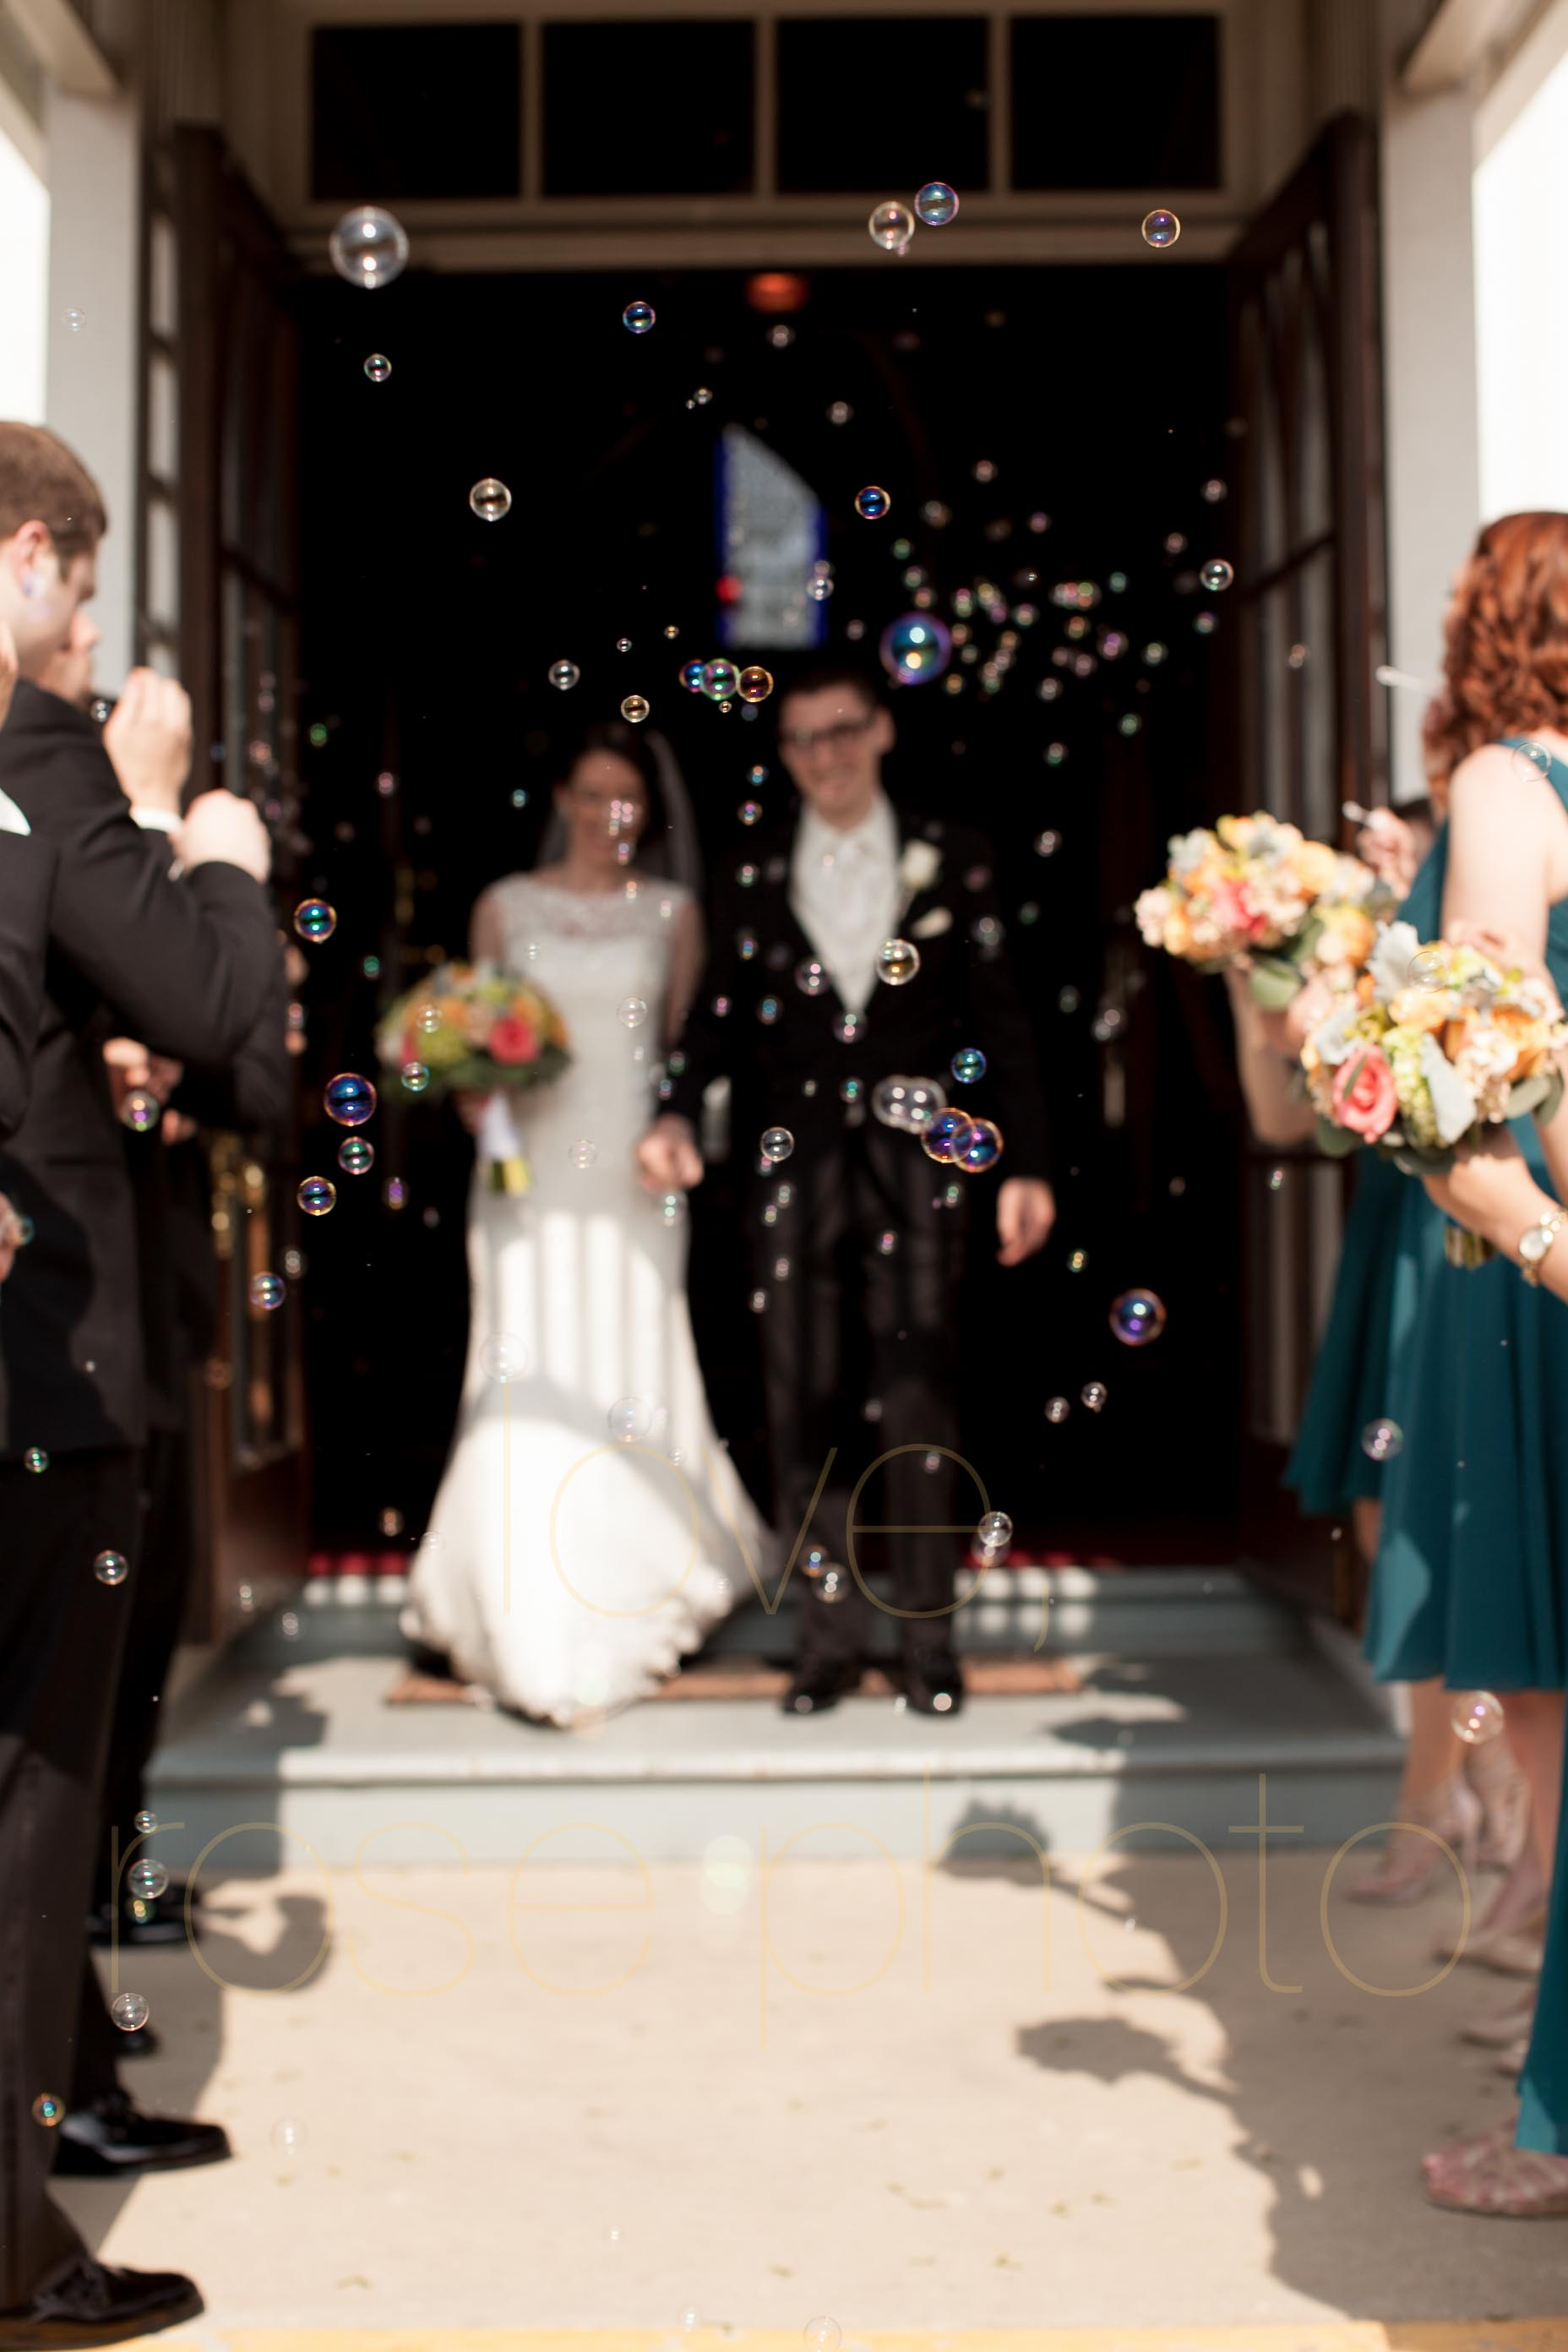 K Bianci maple chaple summer wedding chicago photographer -0234.jpg